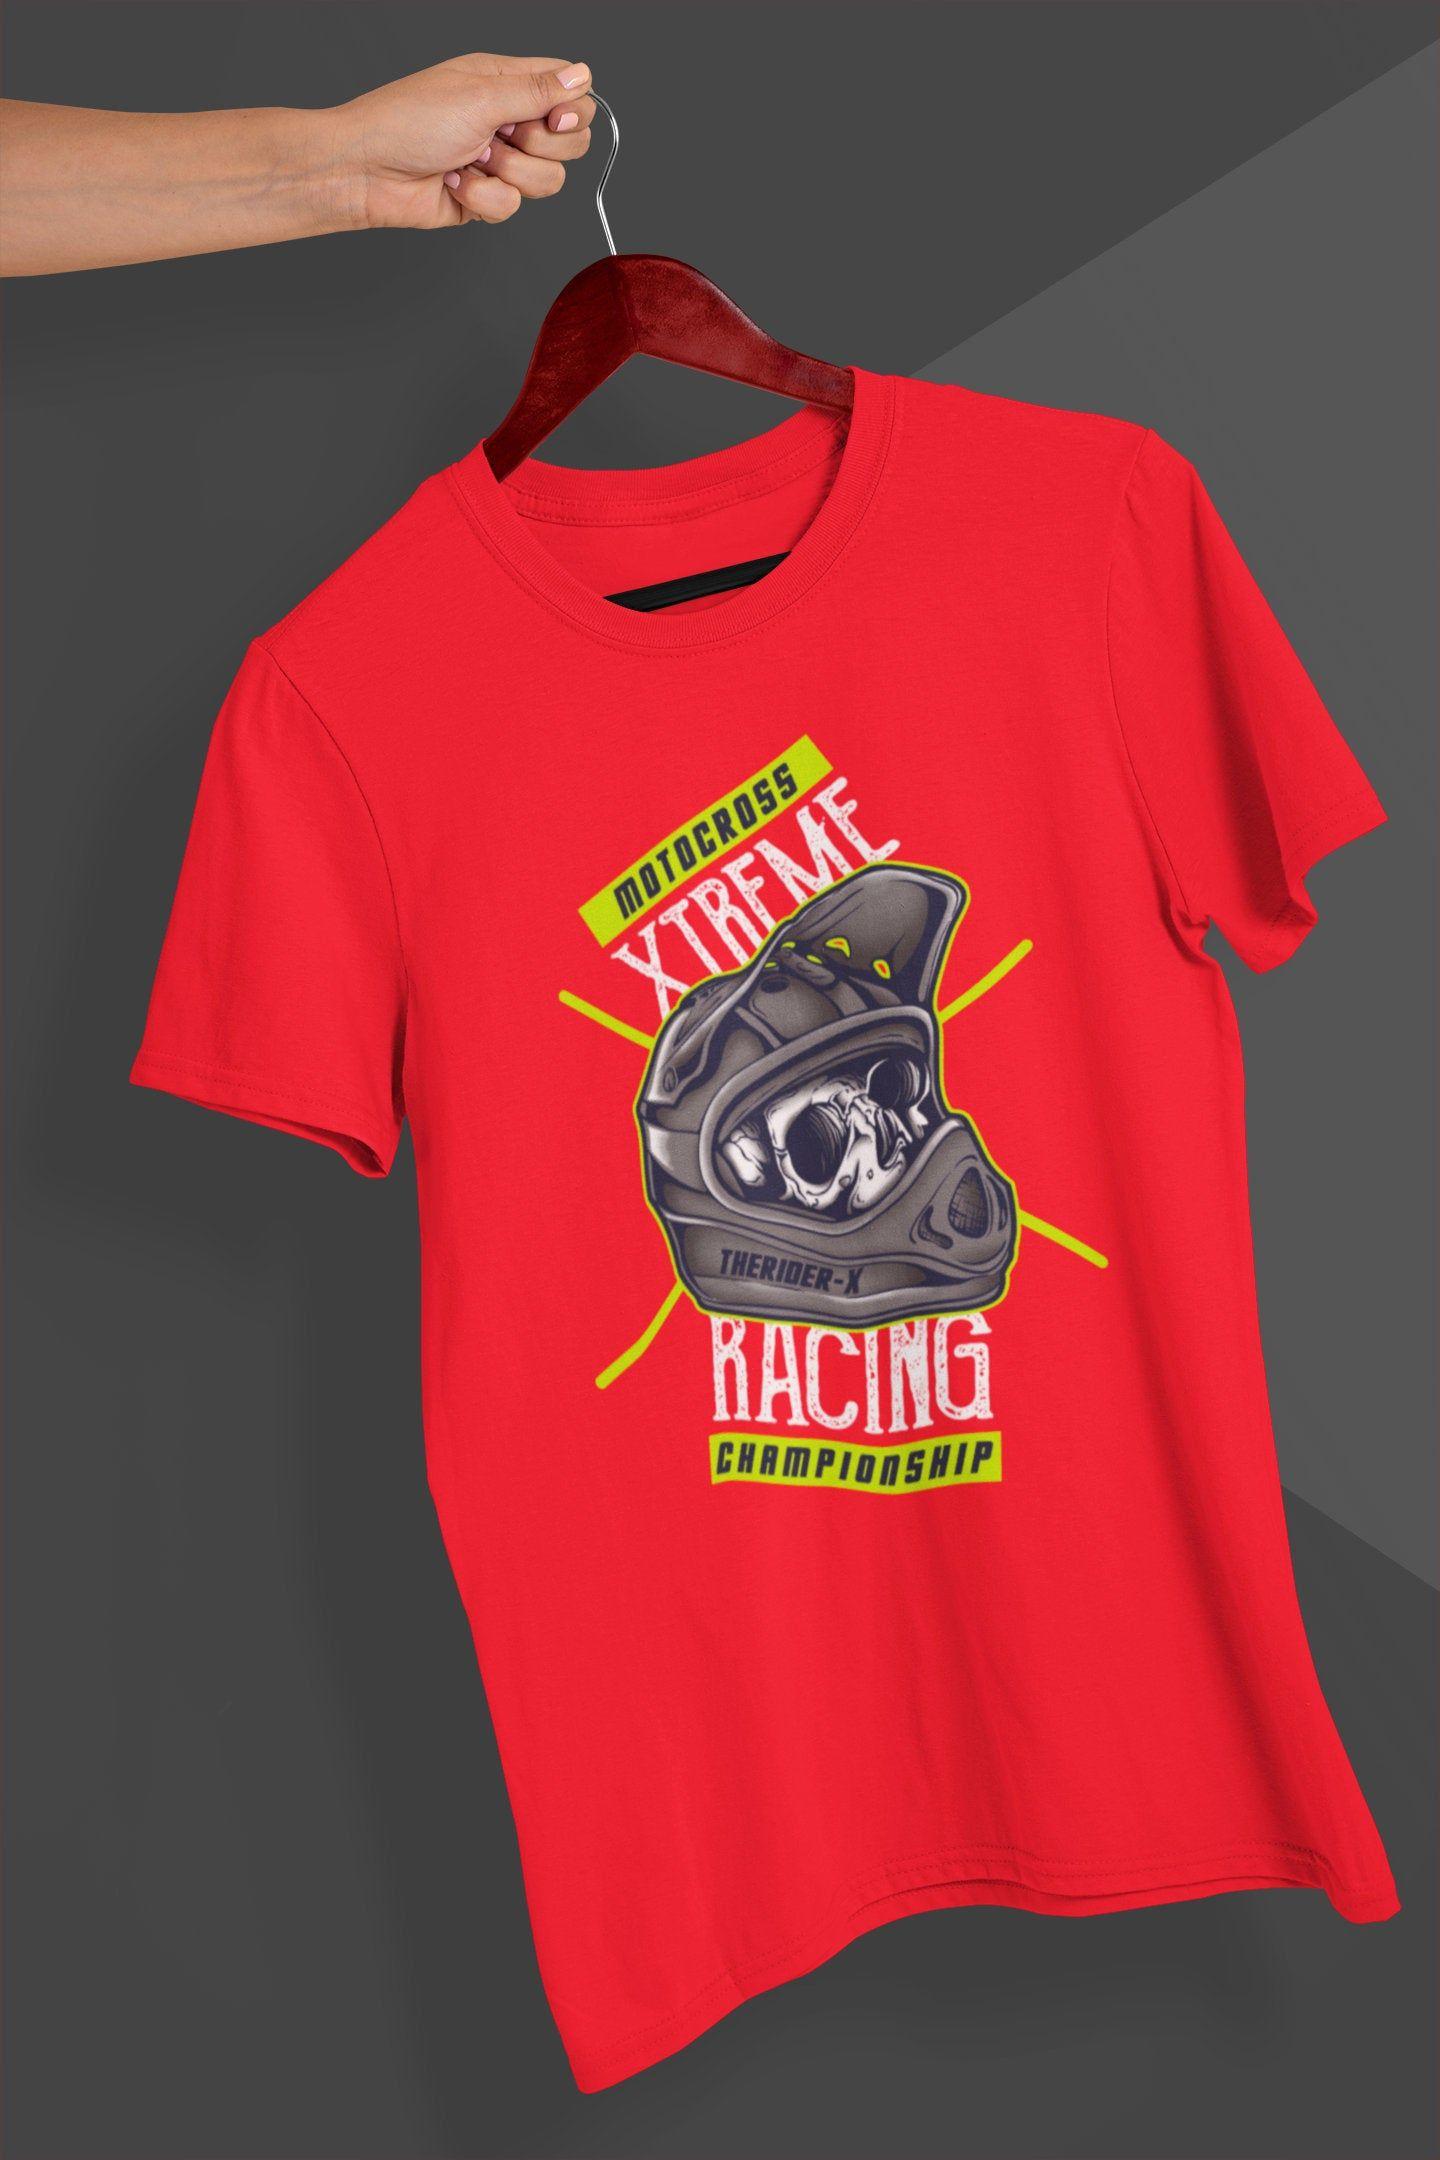 Extreme motocross shirt, moto cross lover tshirt, extreme